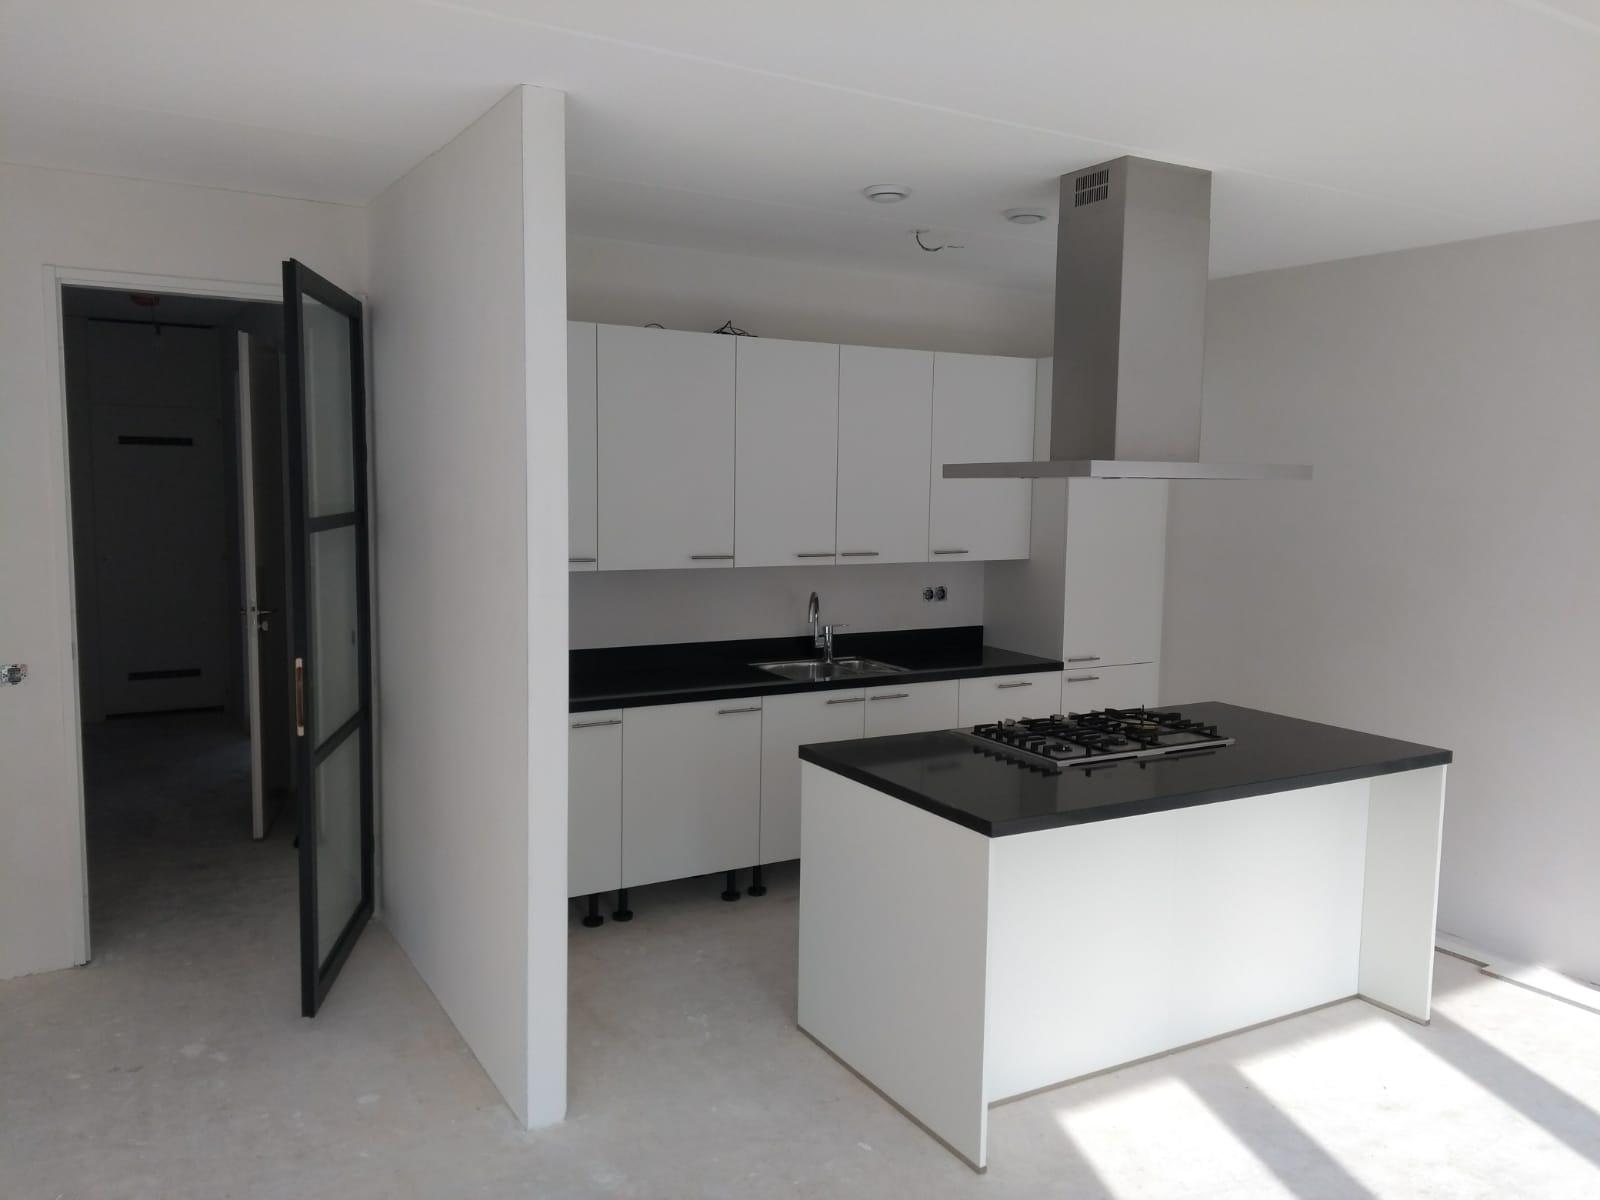 Keuken-rosmalen-2